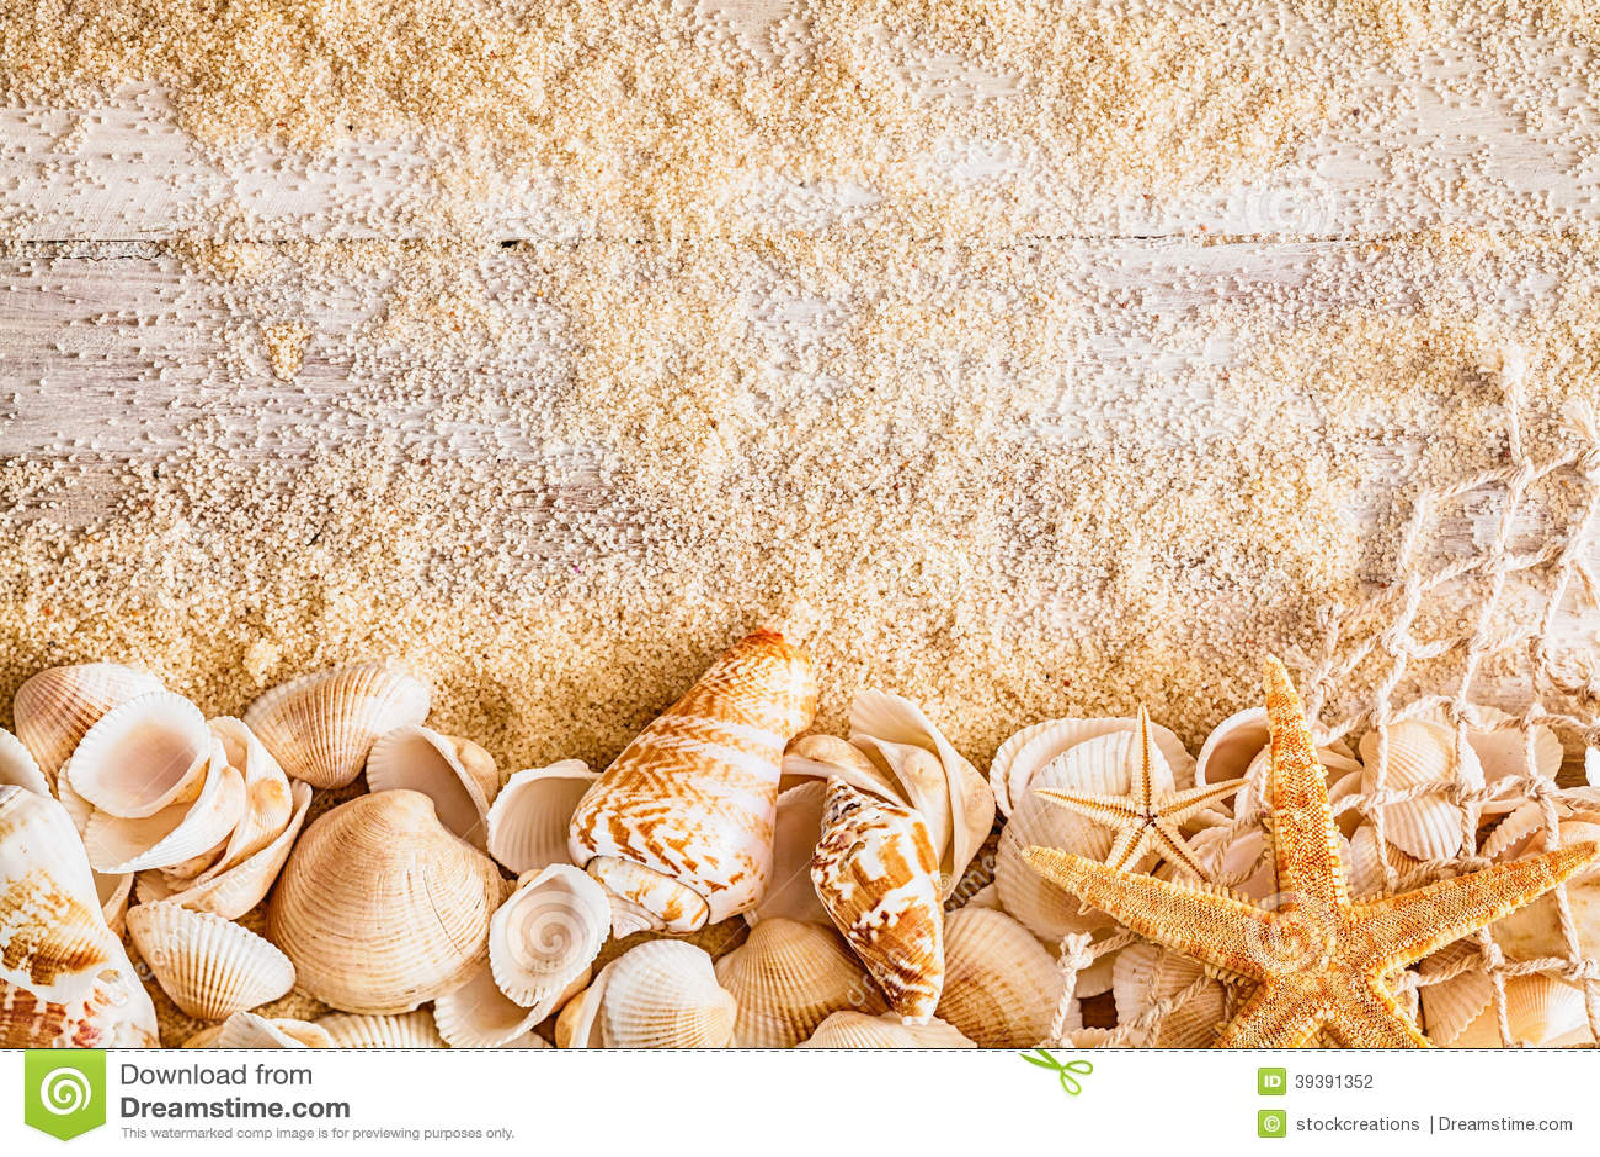 Nautical Background And Border Of Seashells